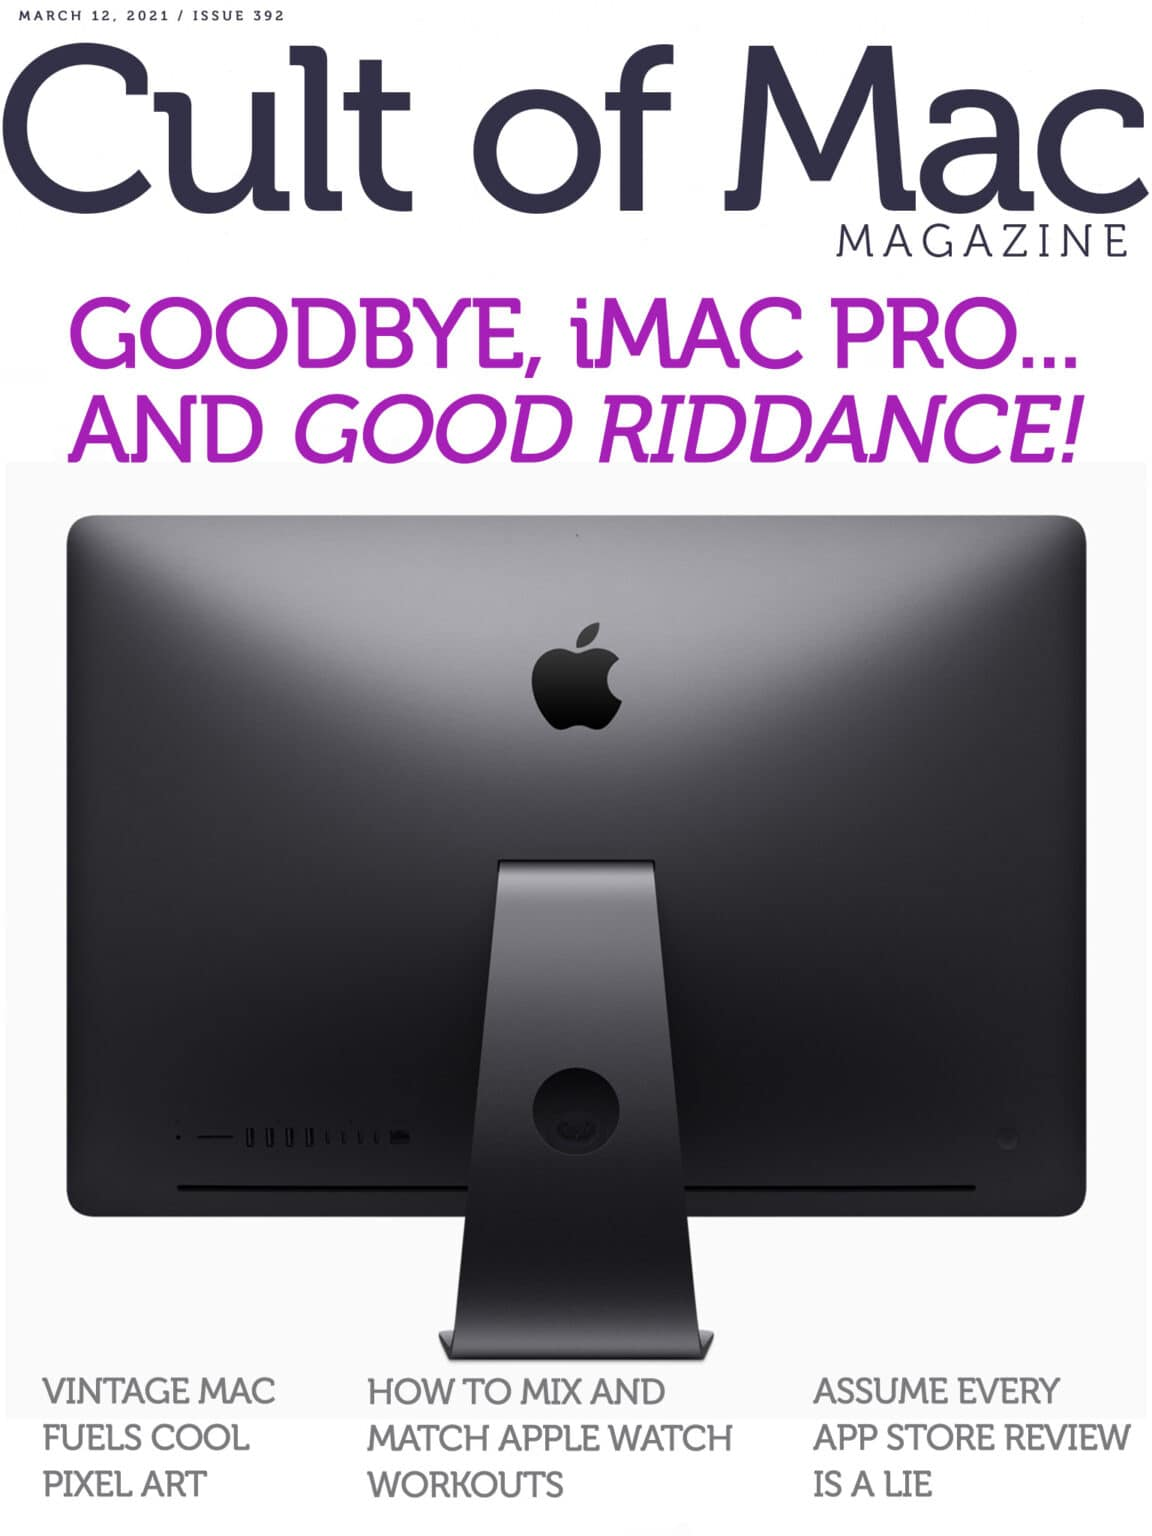 Goodbye, iMac Pro ... and good riddance.